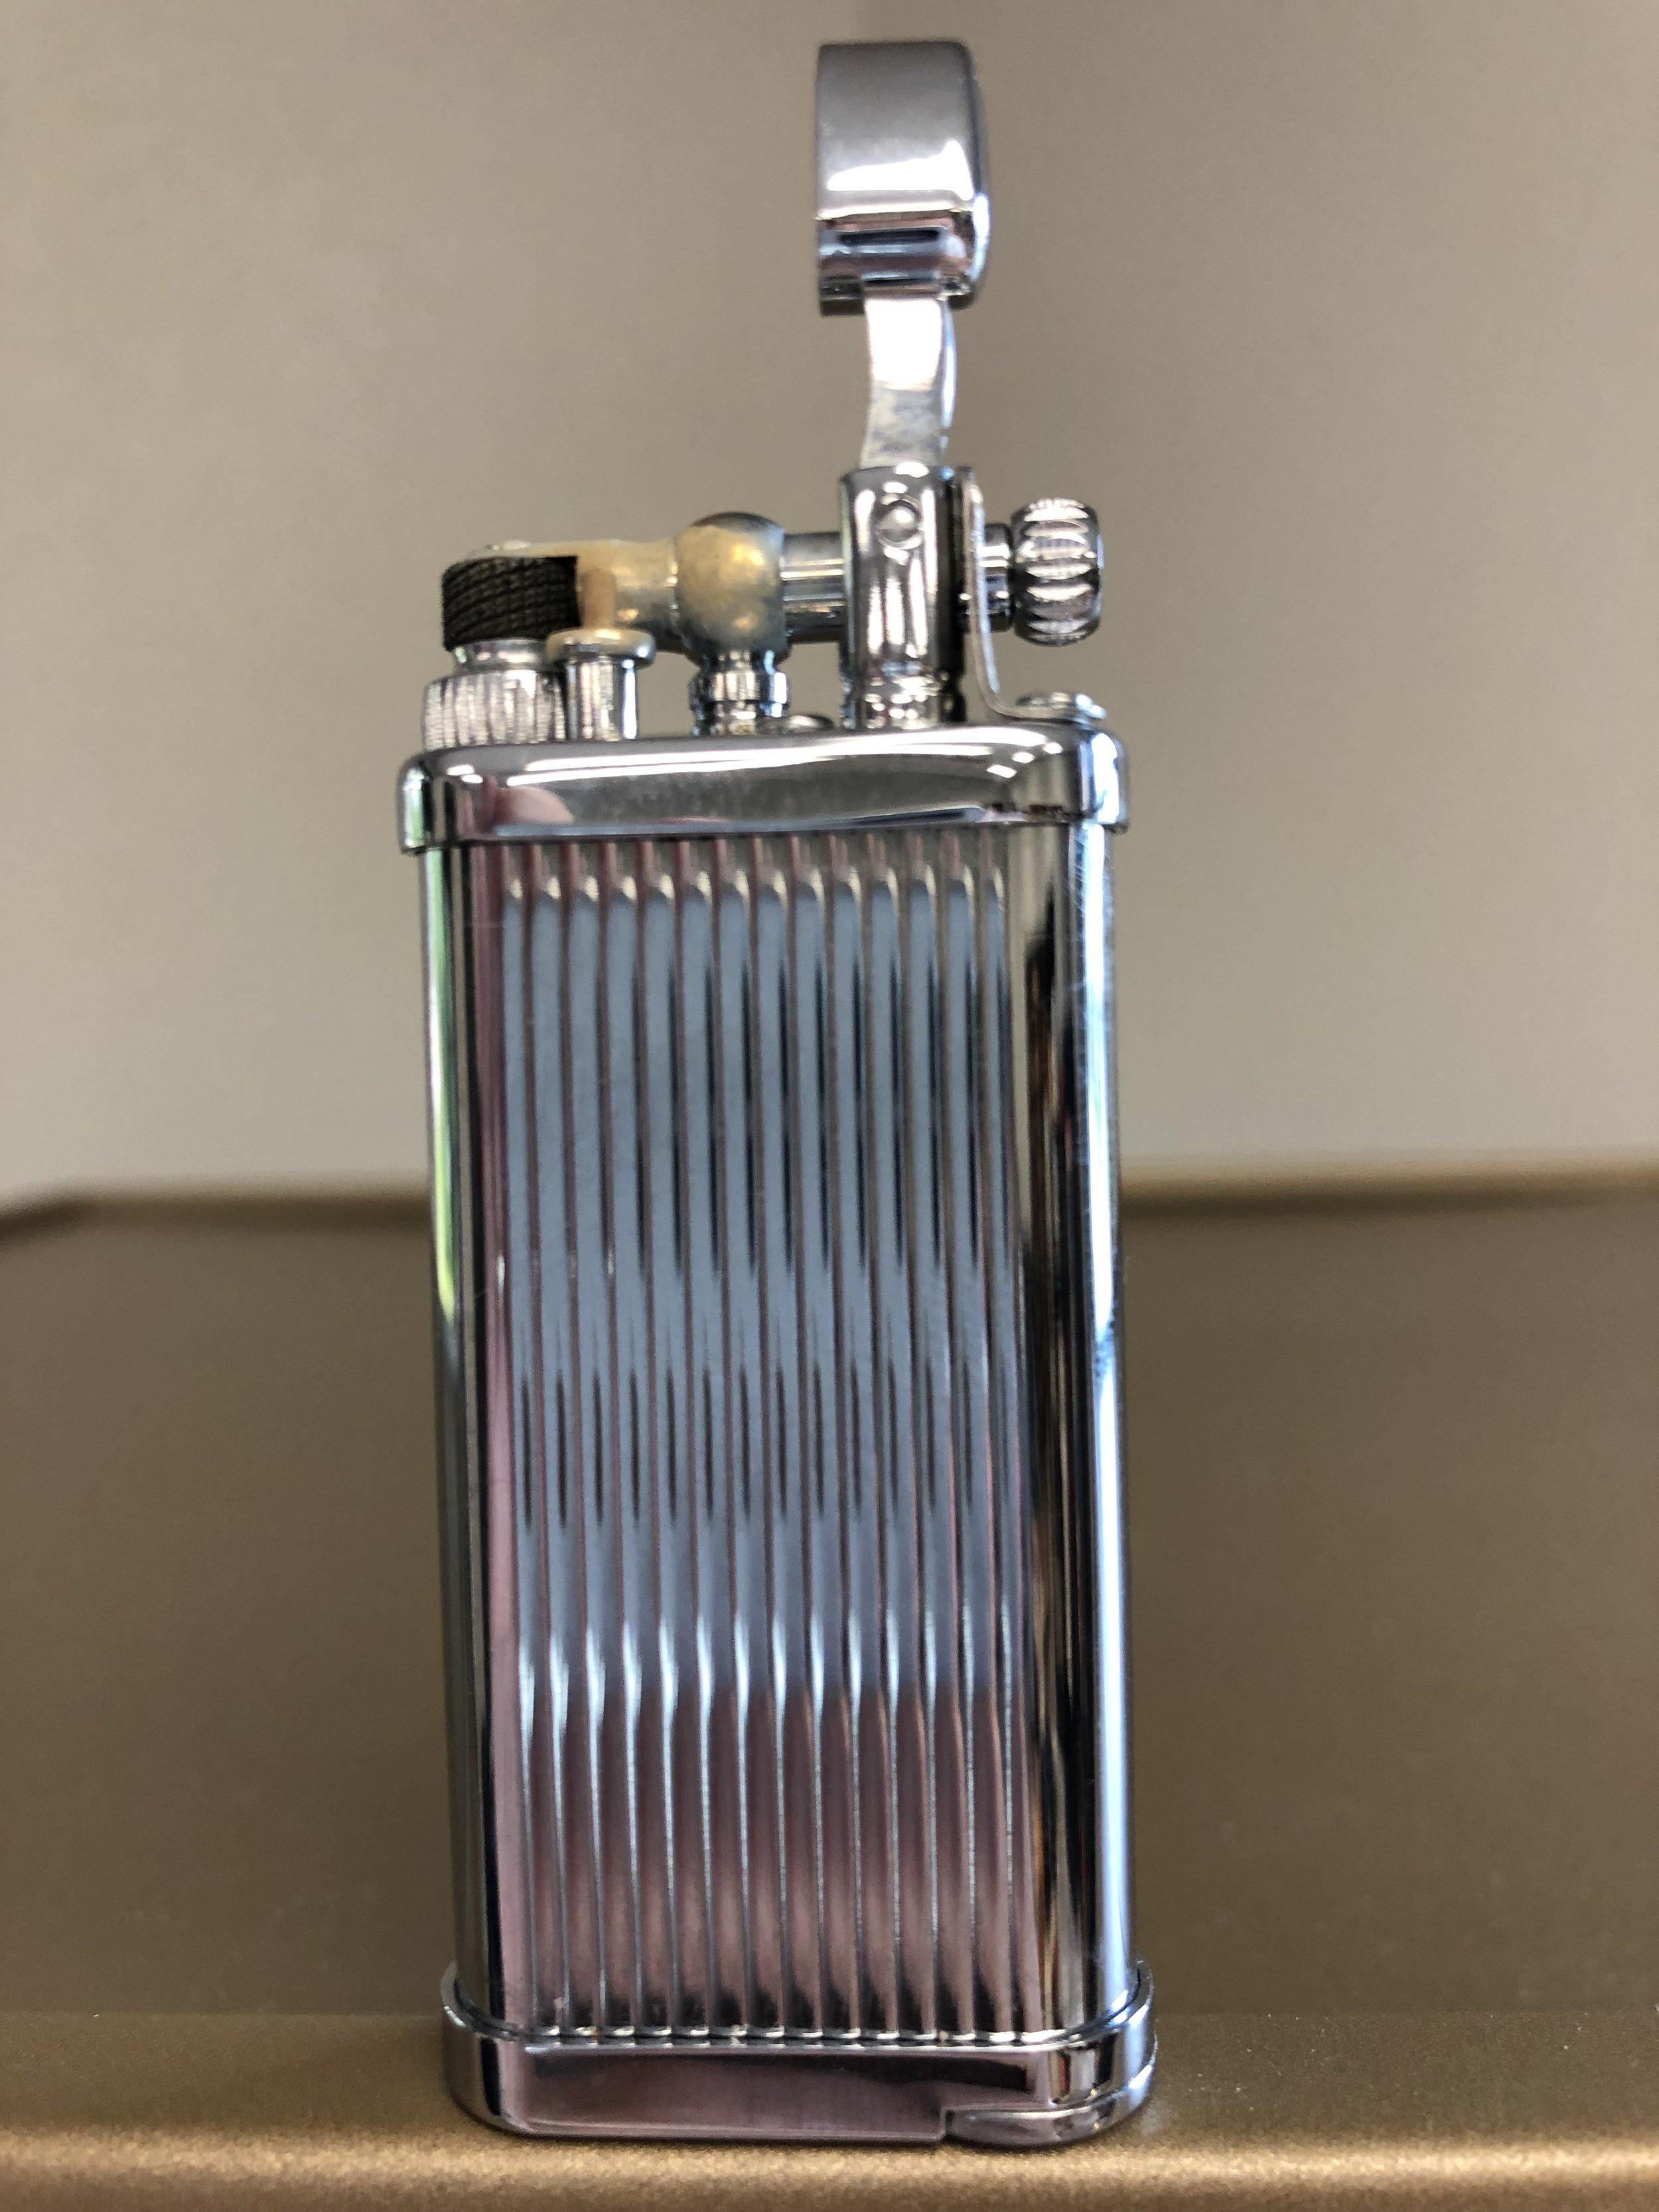 IM Corona Old Boy pipe lighter